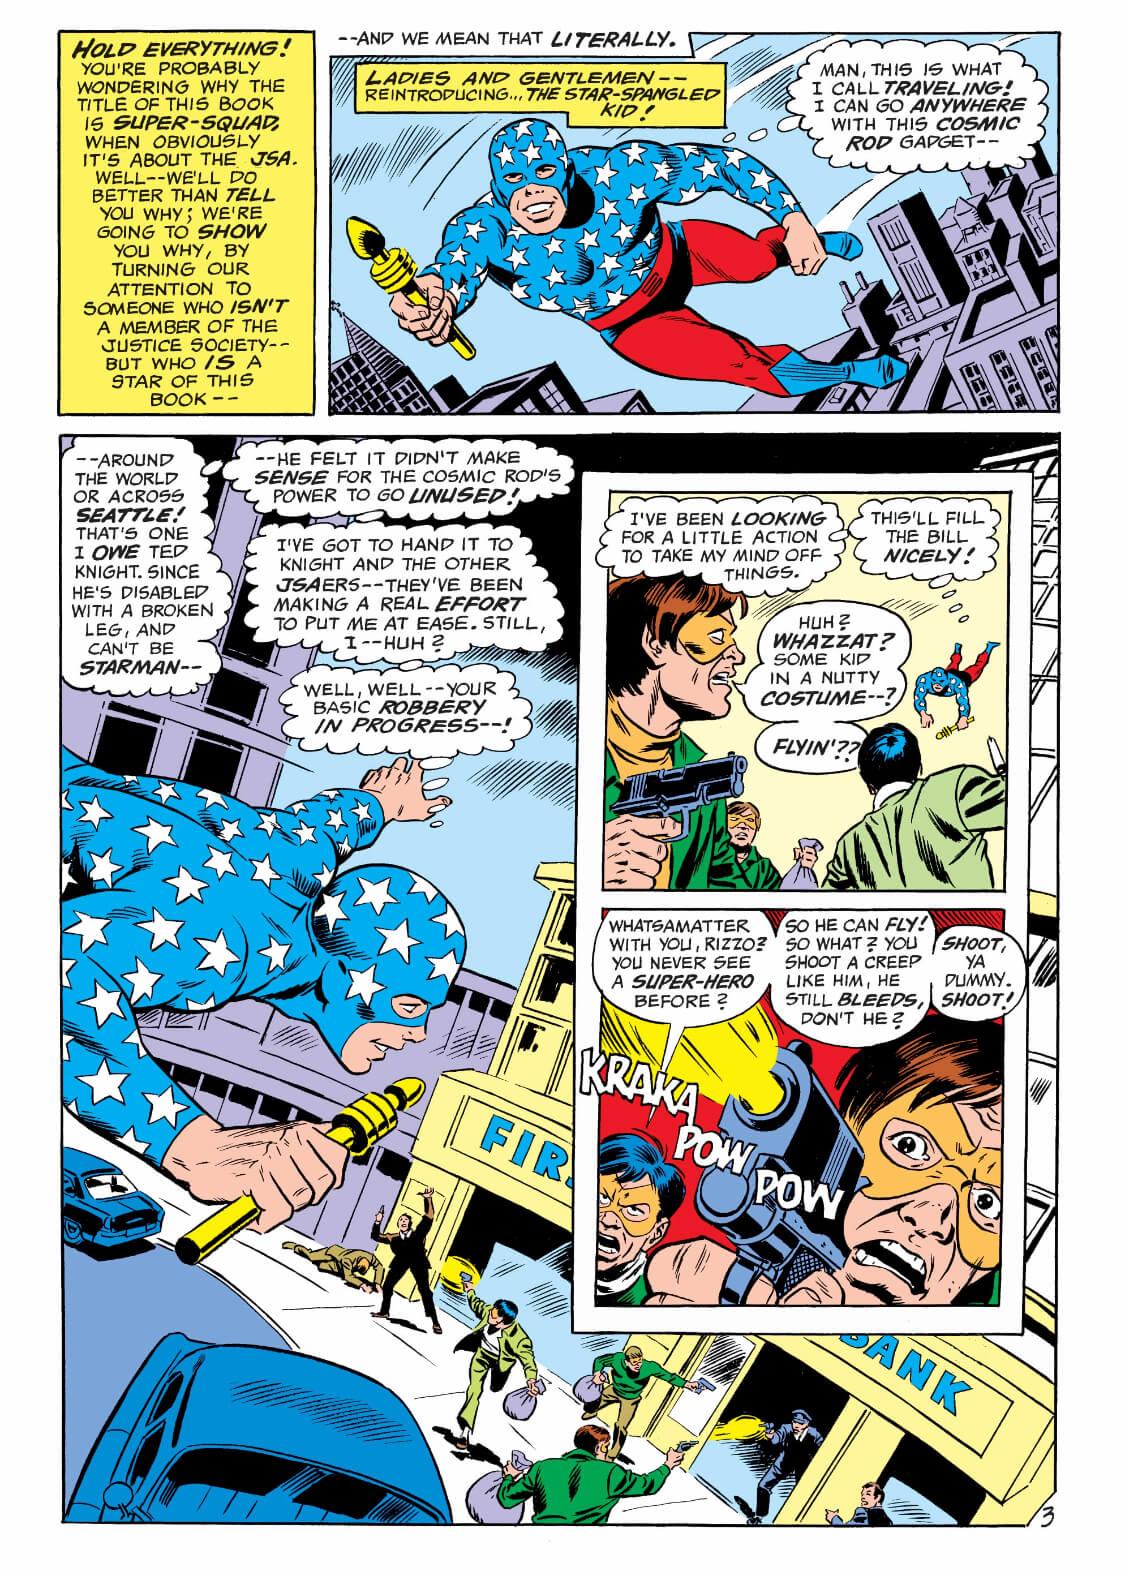 Star-Spangled-Kid-Cosmic-Staff-Starman.jpg